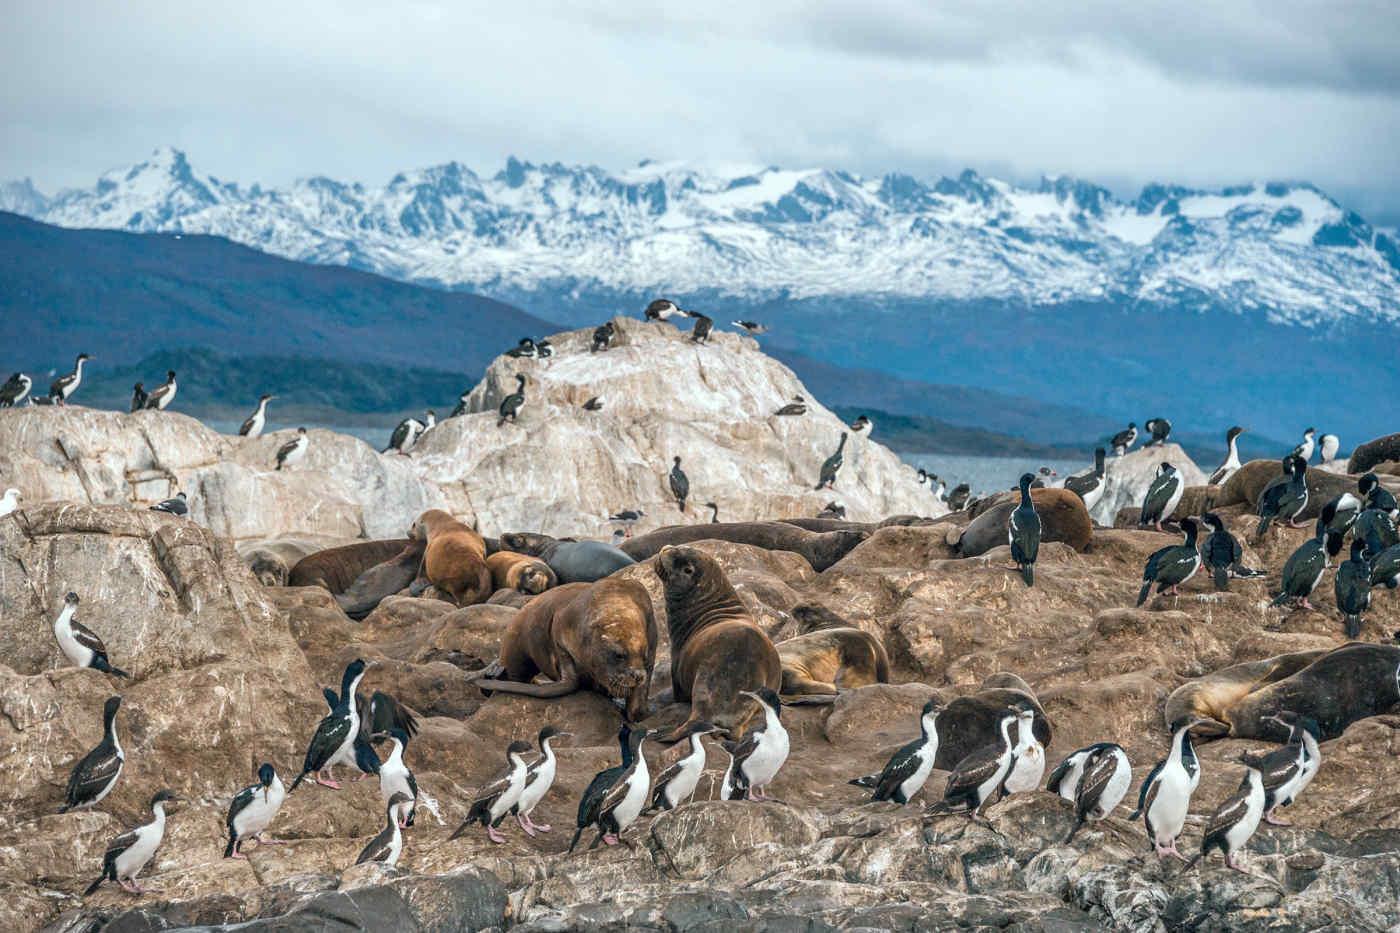 Beagle Channel • Ushuaia, Argentina